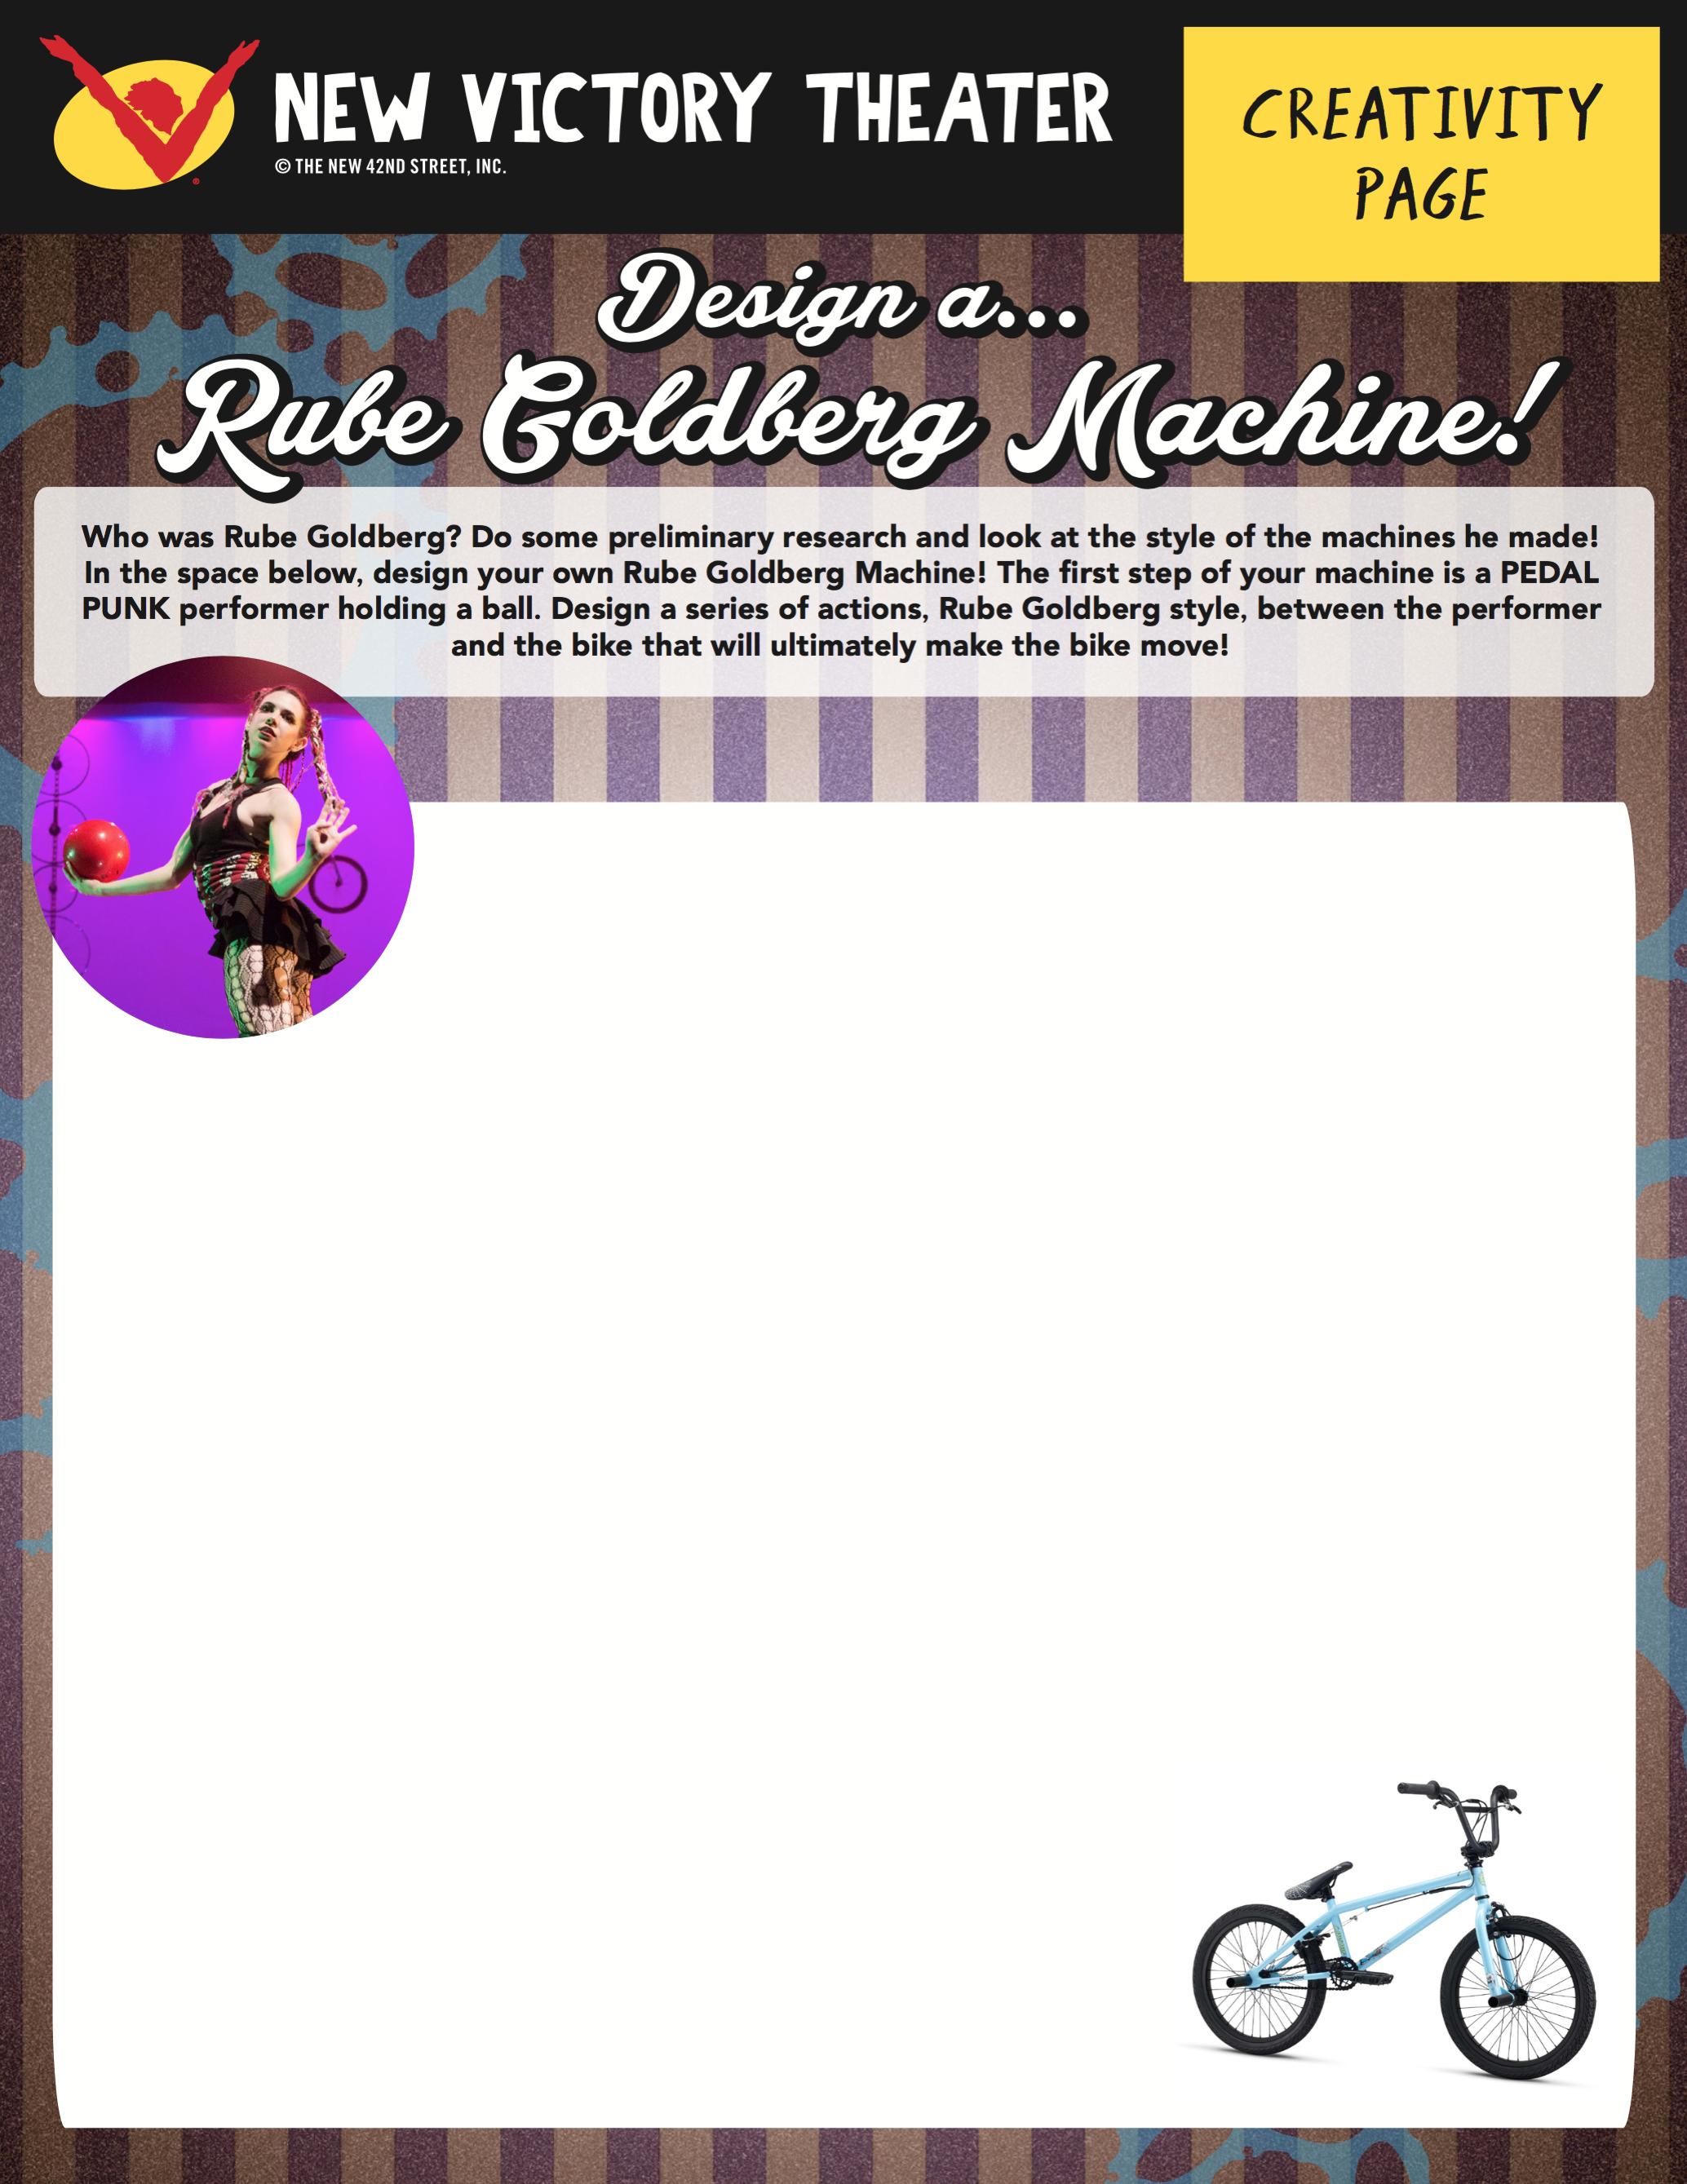 Design A Wacky Rube Goldberg Machine That Starts With A